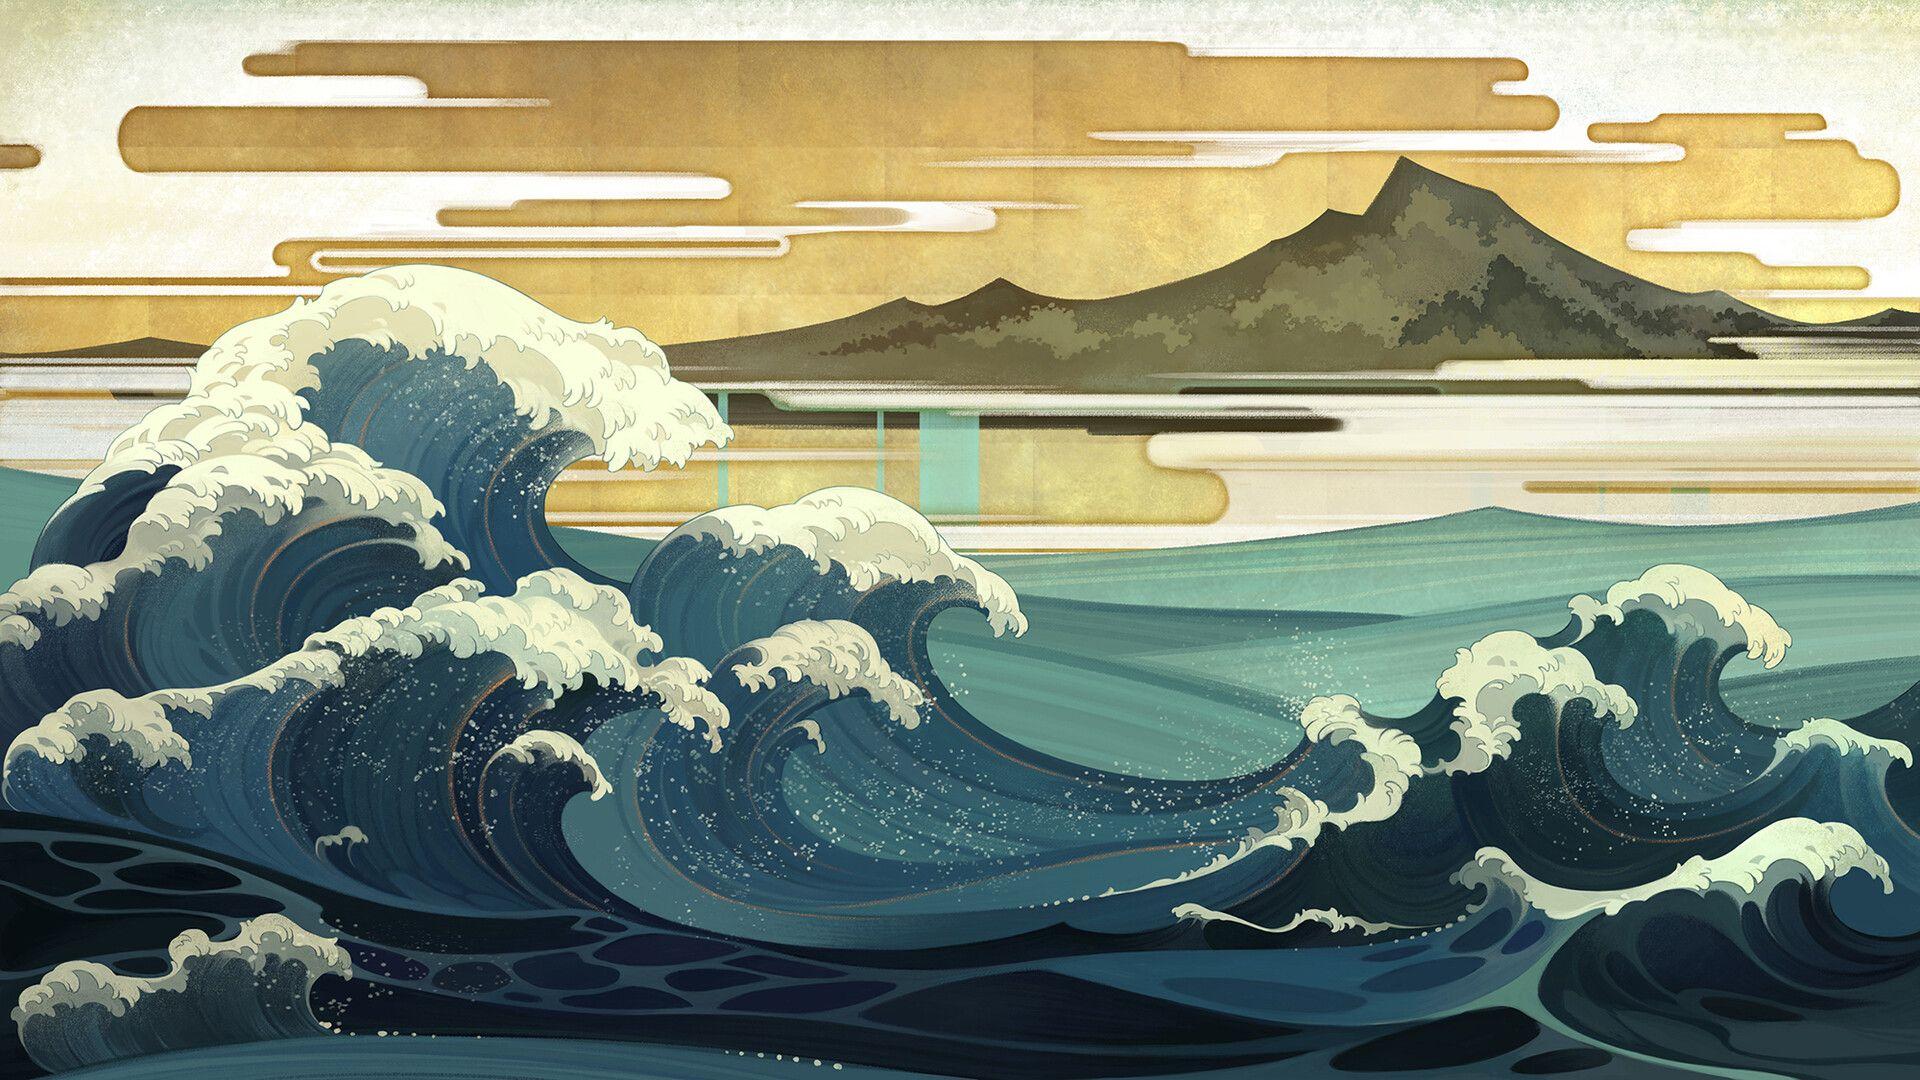 Aric Artstation Com Art Japanese Japaneseart Bigwave Tradidionalart Japan Desktop Wallpaper Art Japanese Art Japanese Background